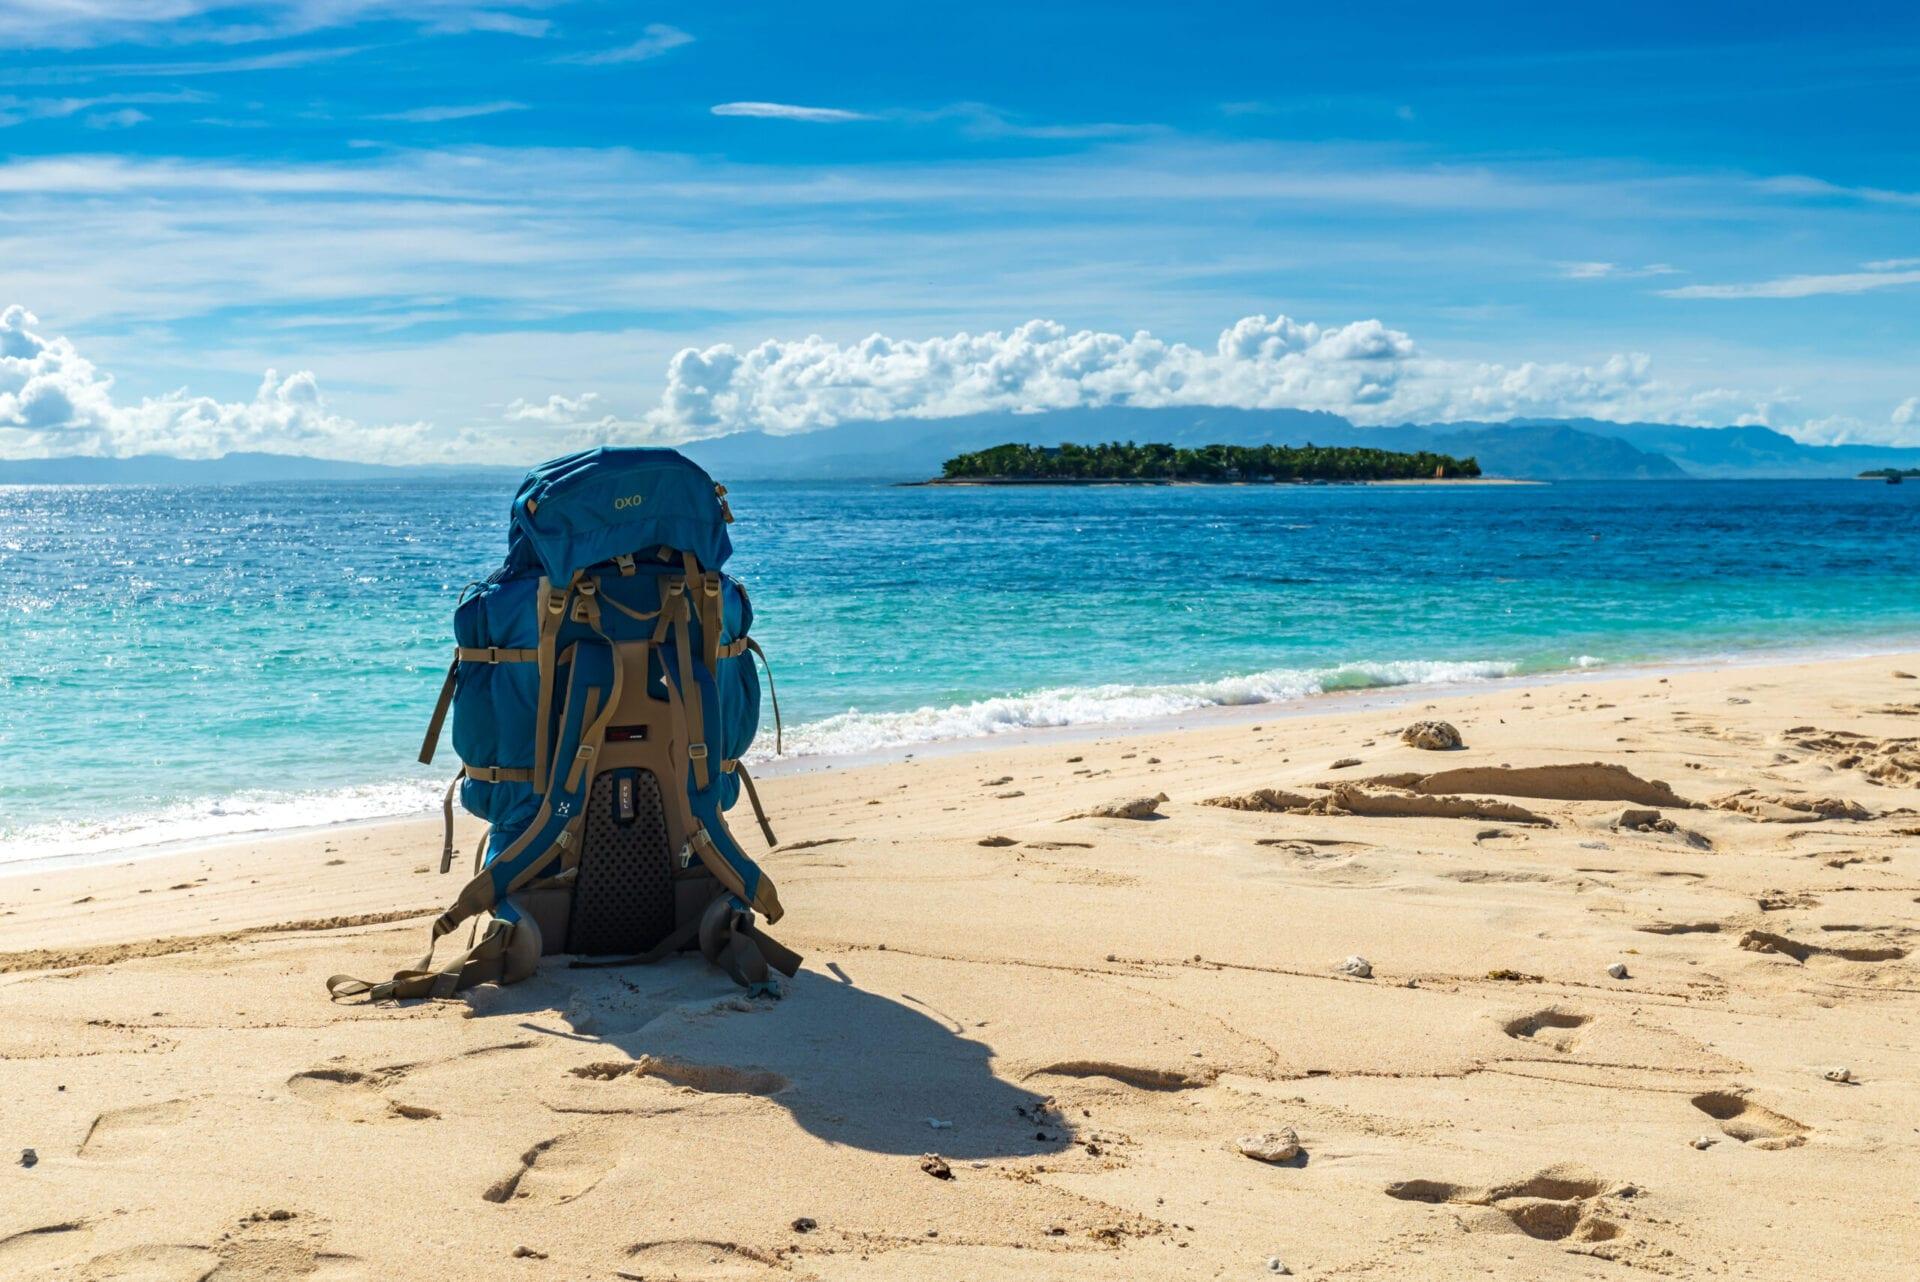 Backpack står alene på strand i solskin på Fiji